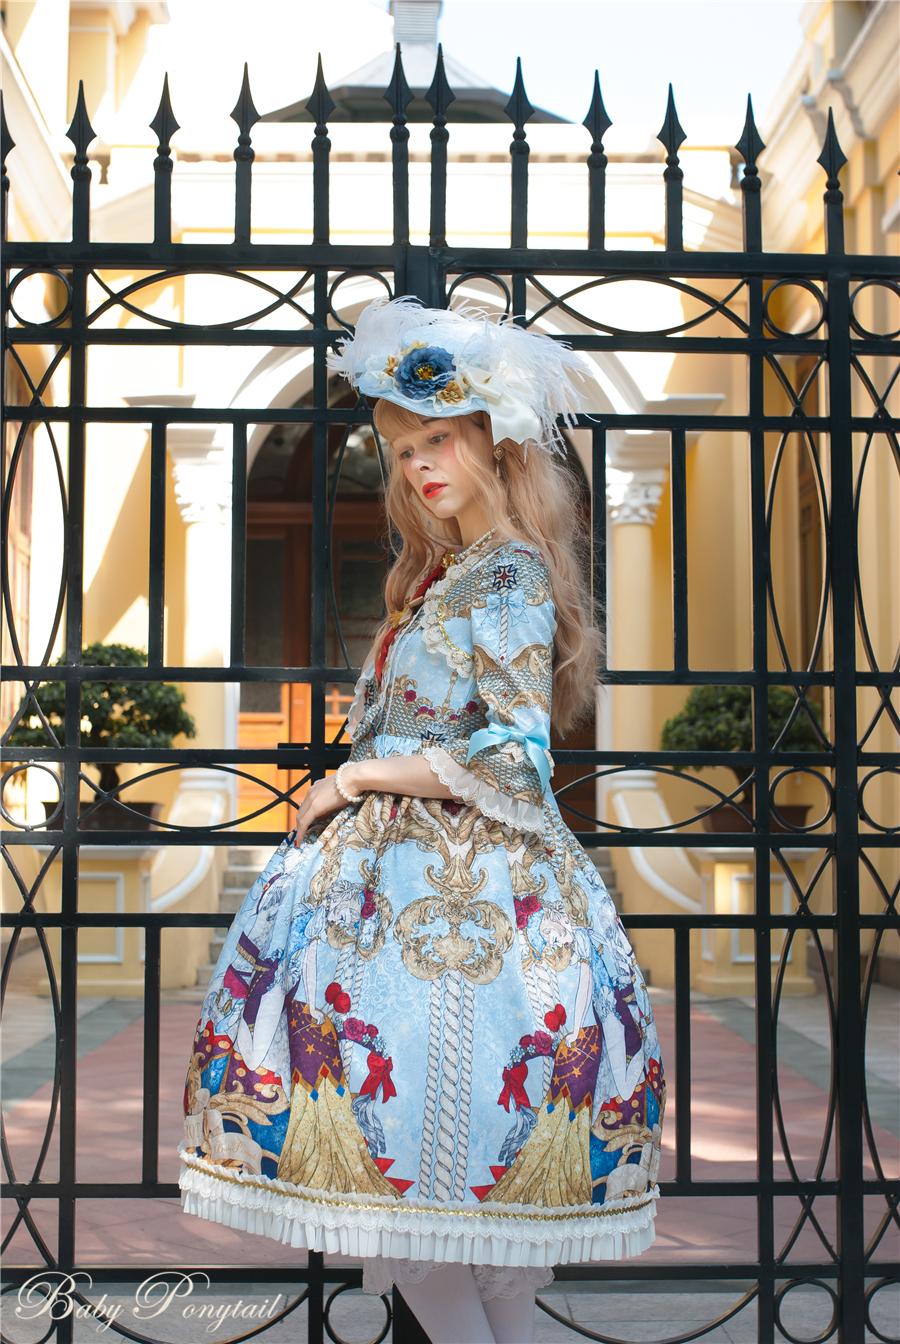 Baby Ponytail_Circus Princess_Sax OP_Claudia_14.jpg